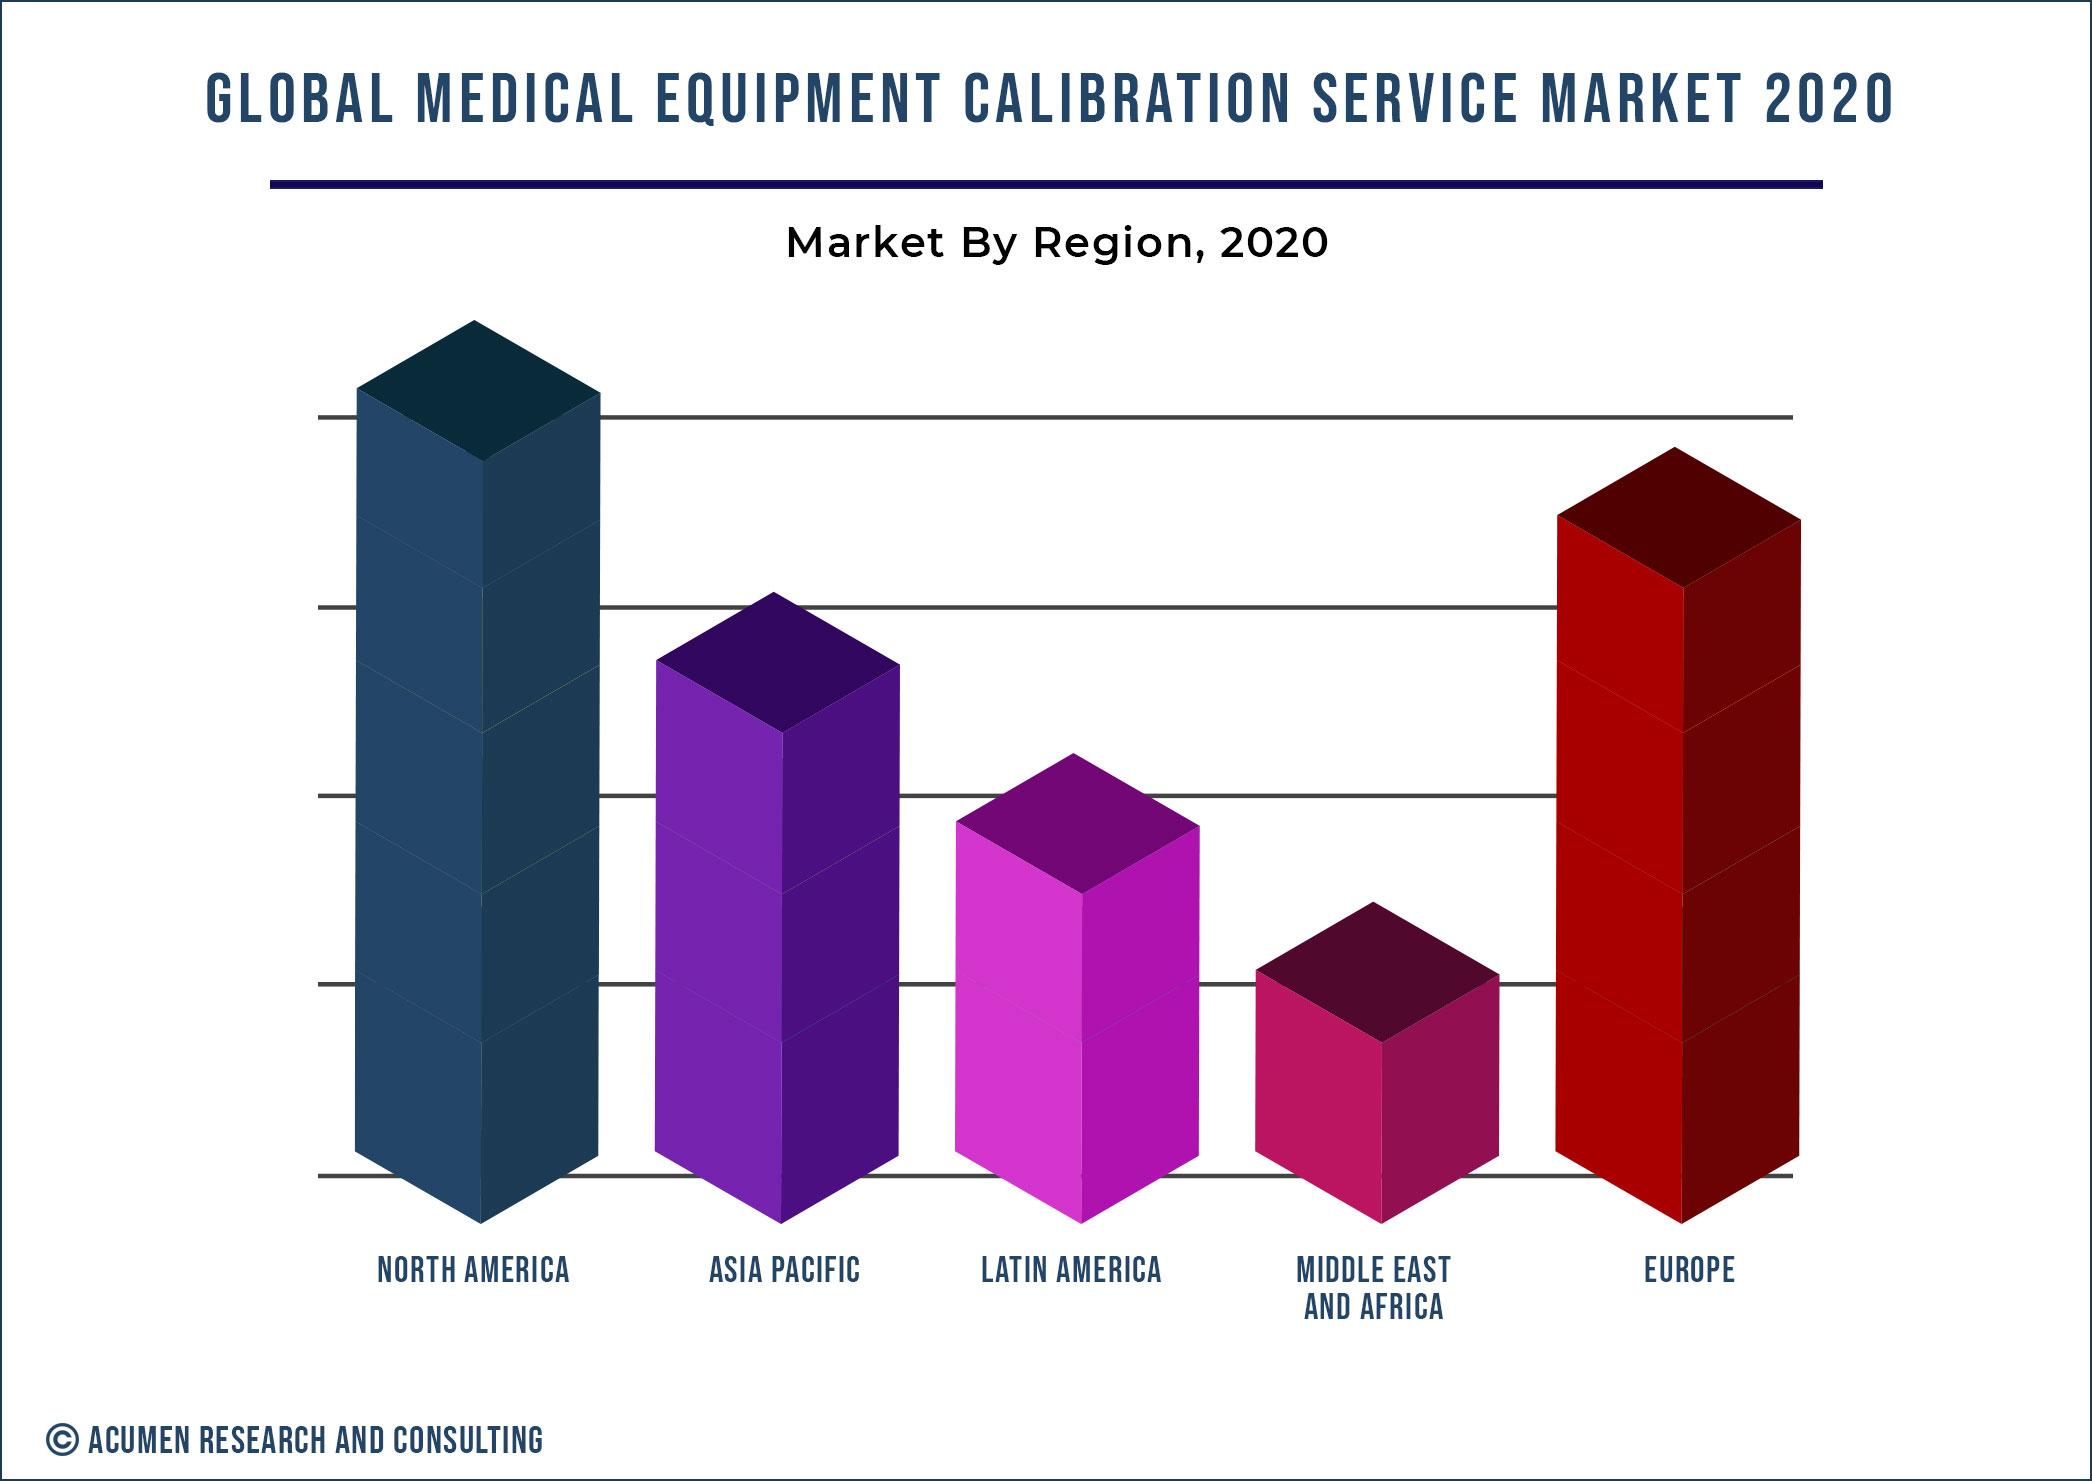 Medical Equipment Calibration Service Market